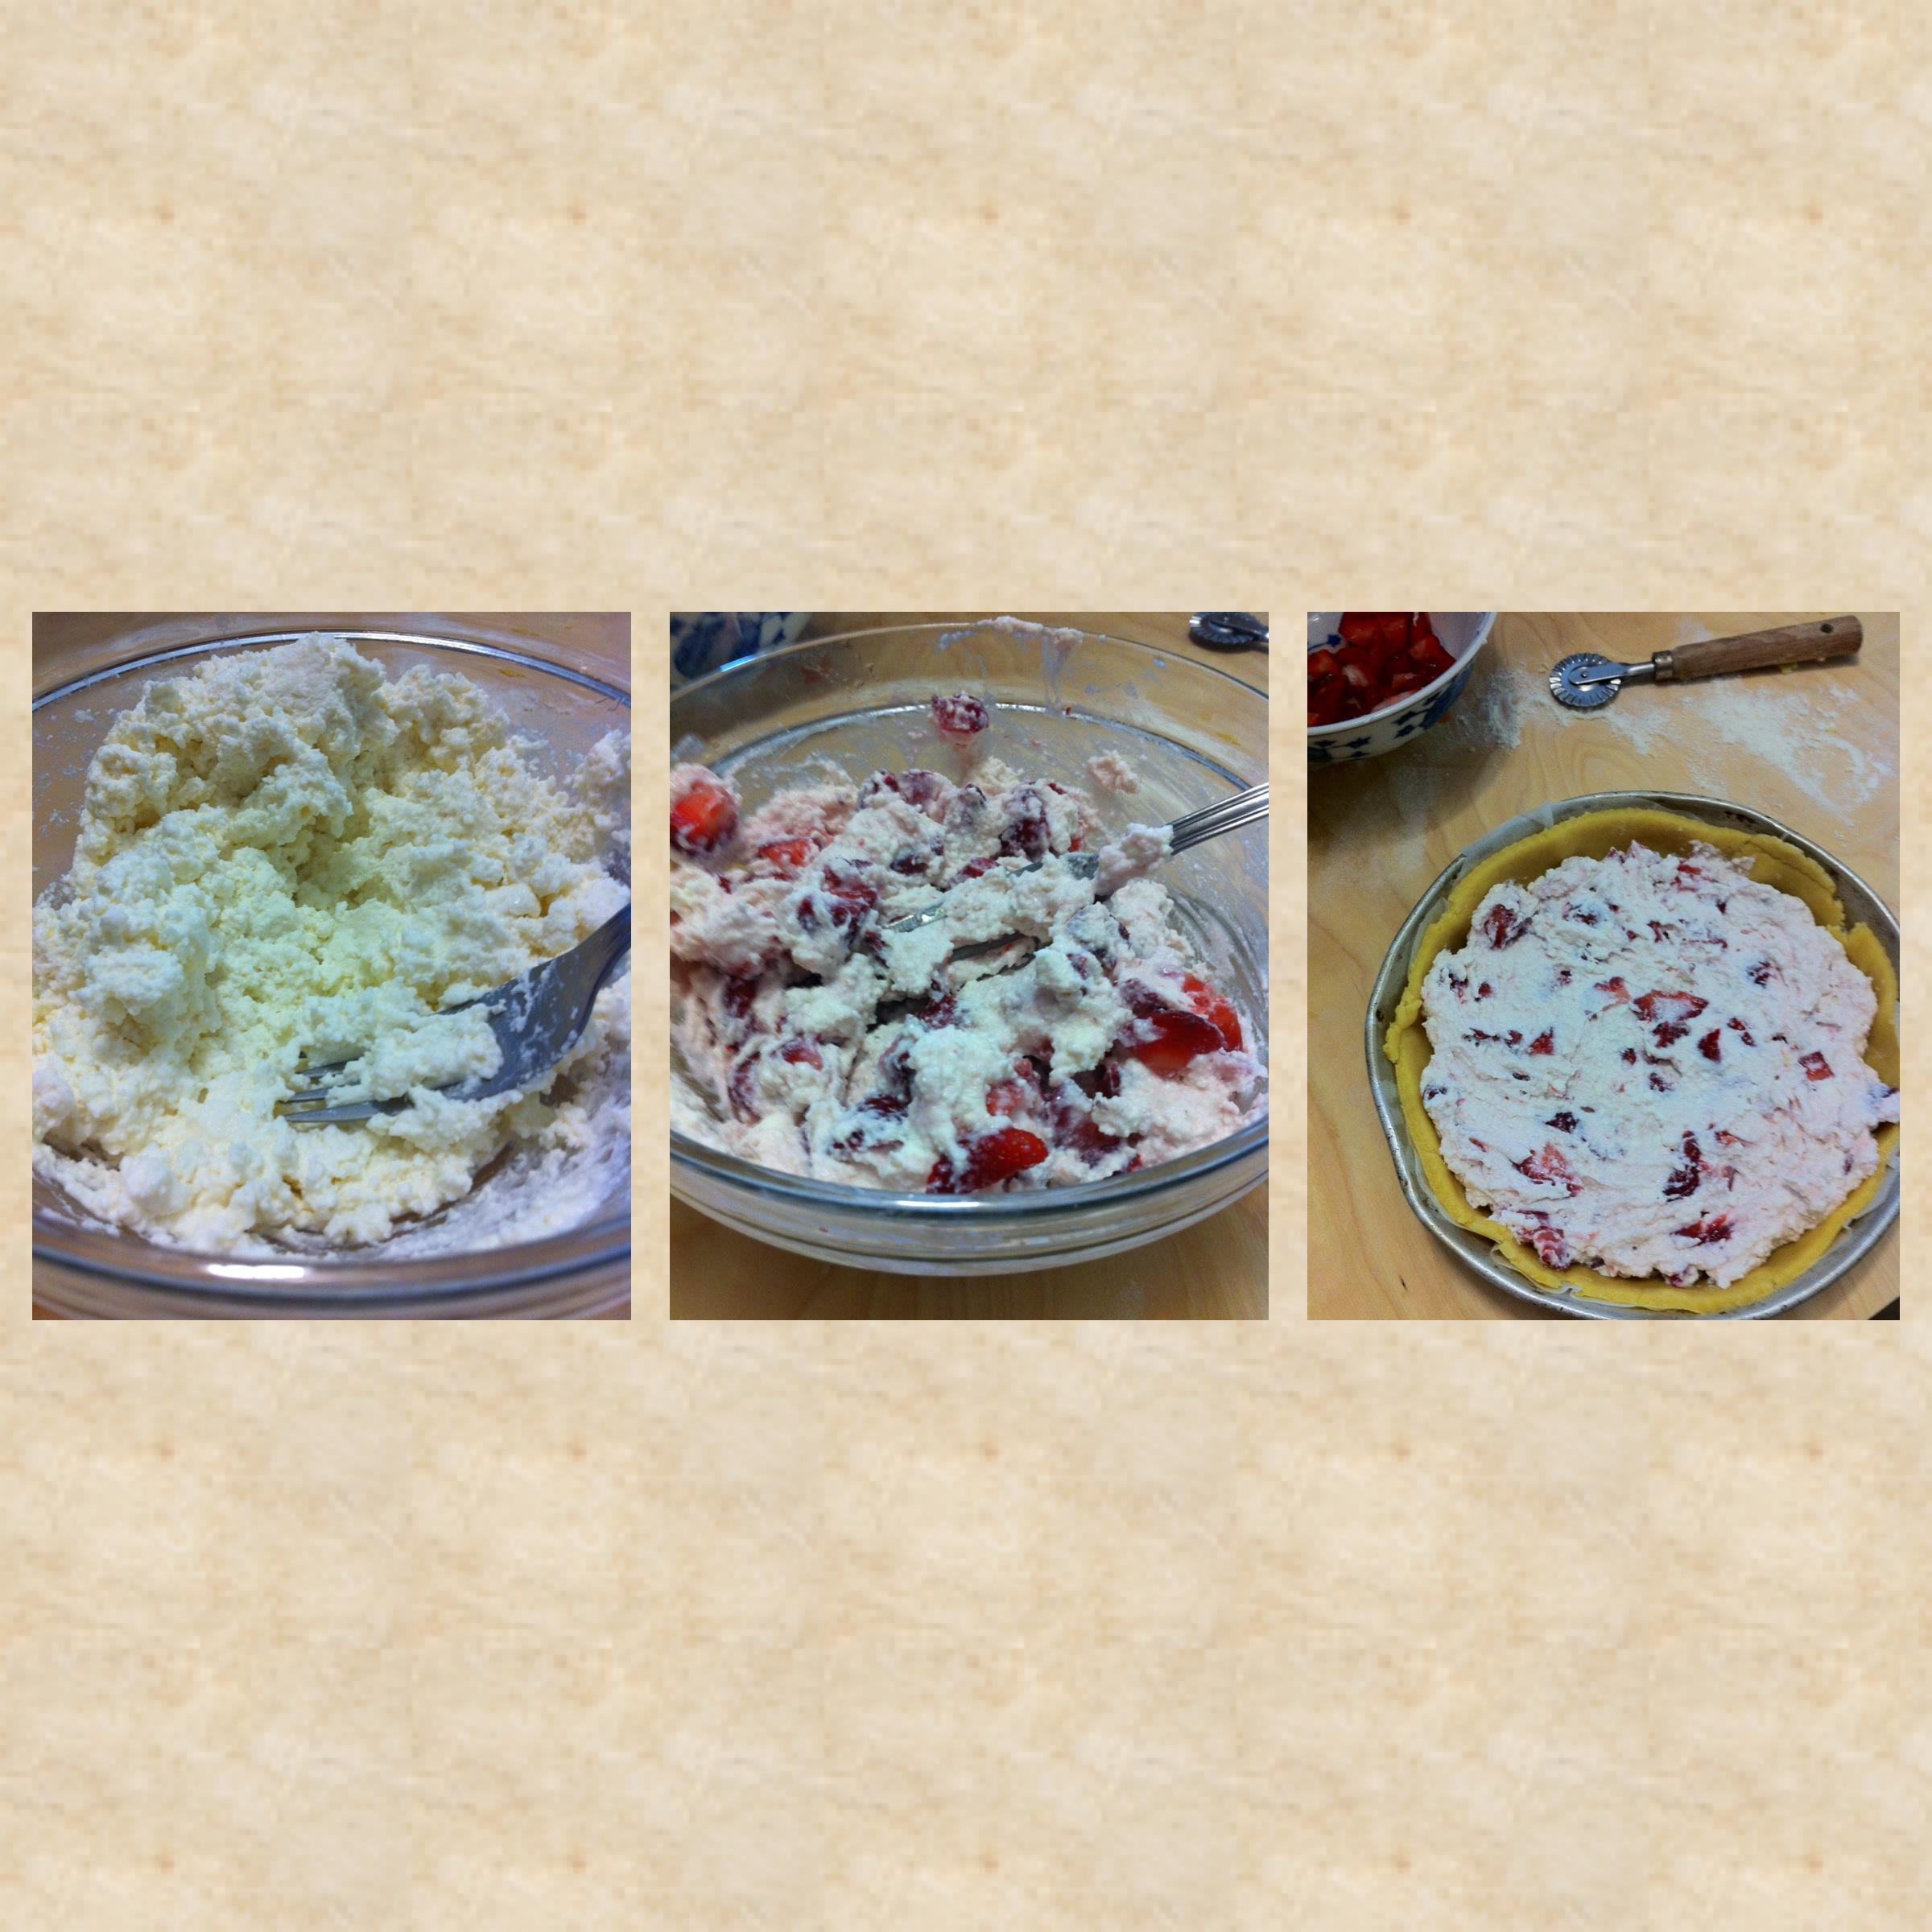 crostata-ricotta-fragole-12.JPG